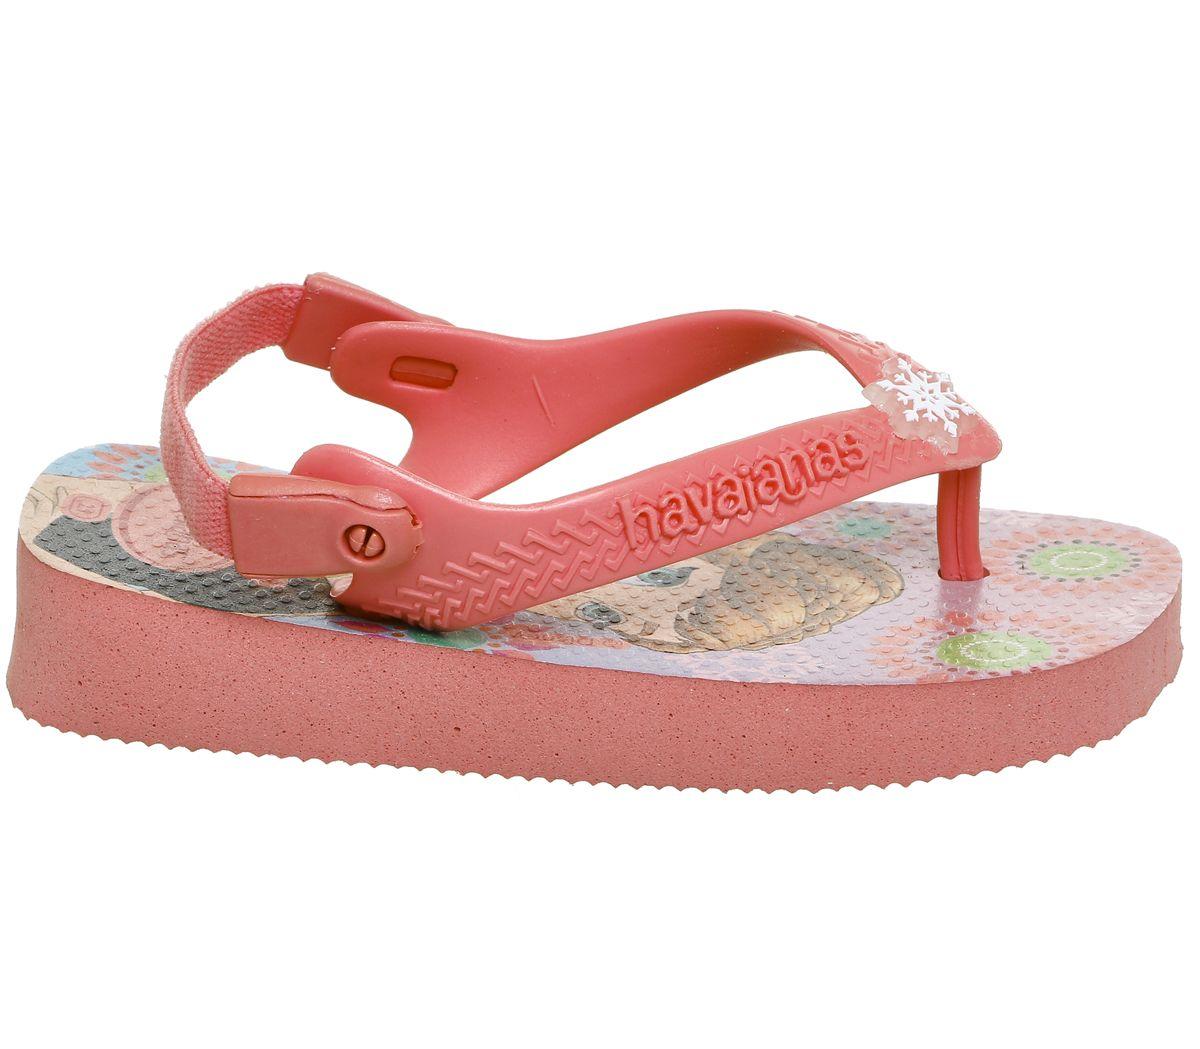 9eff9315a Havaianas Baby Brazil Sandals Rose Frozen - Unisex